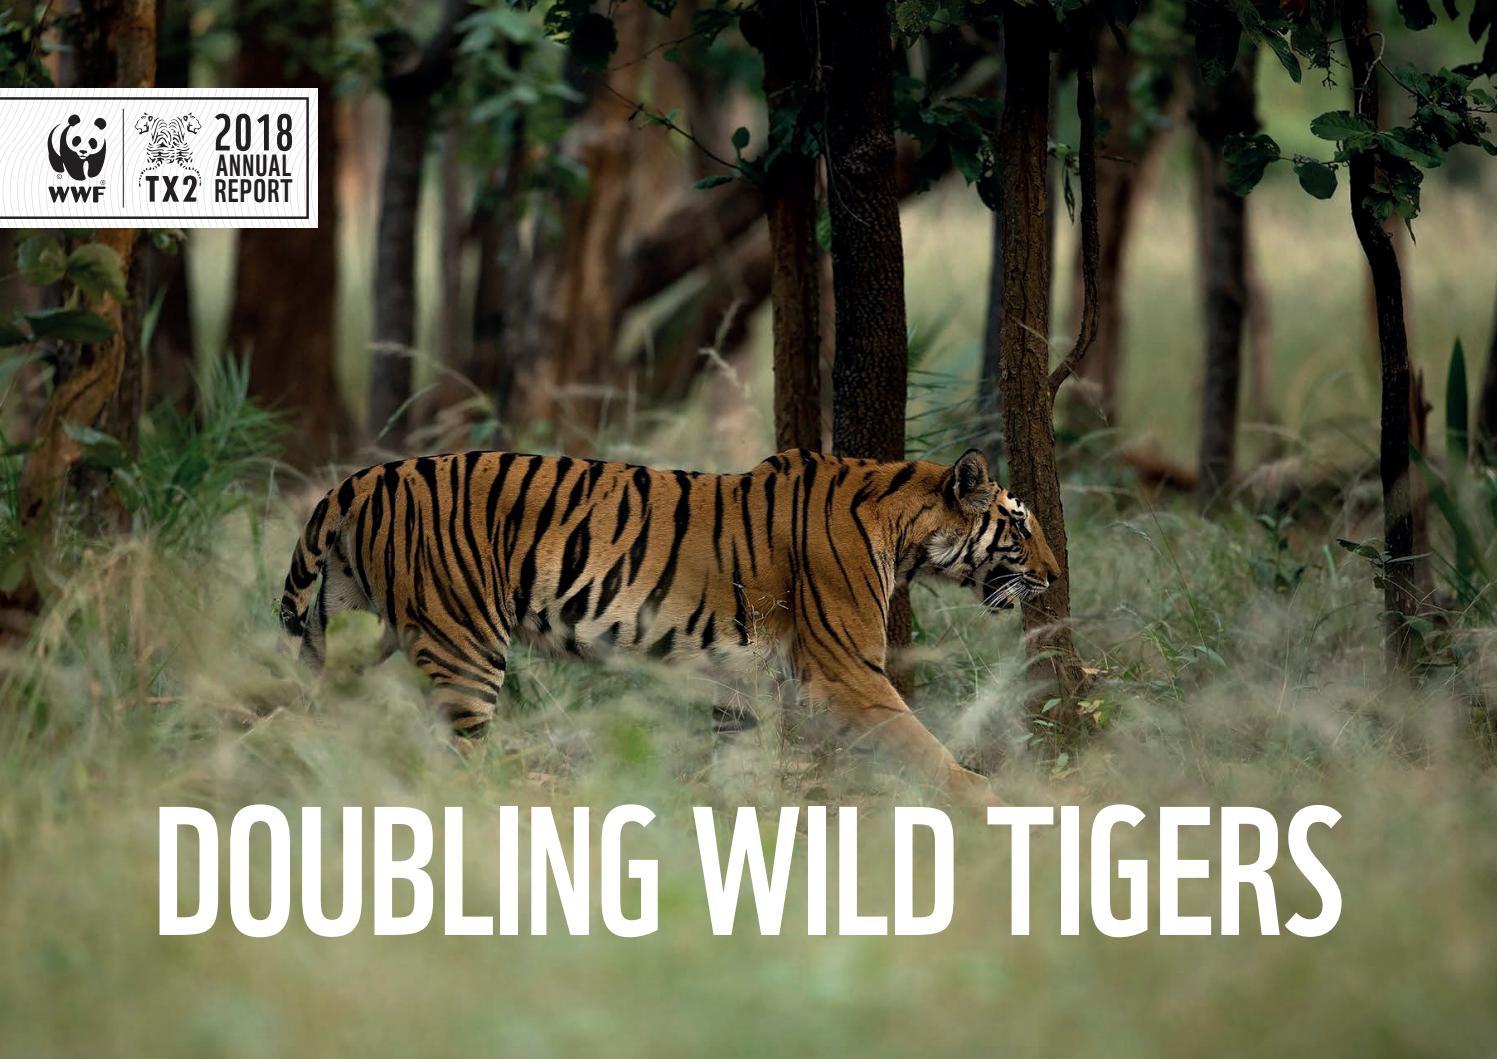 Tiger rich investments ltd bnp paribas investment partners usa holdings inc